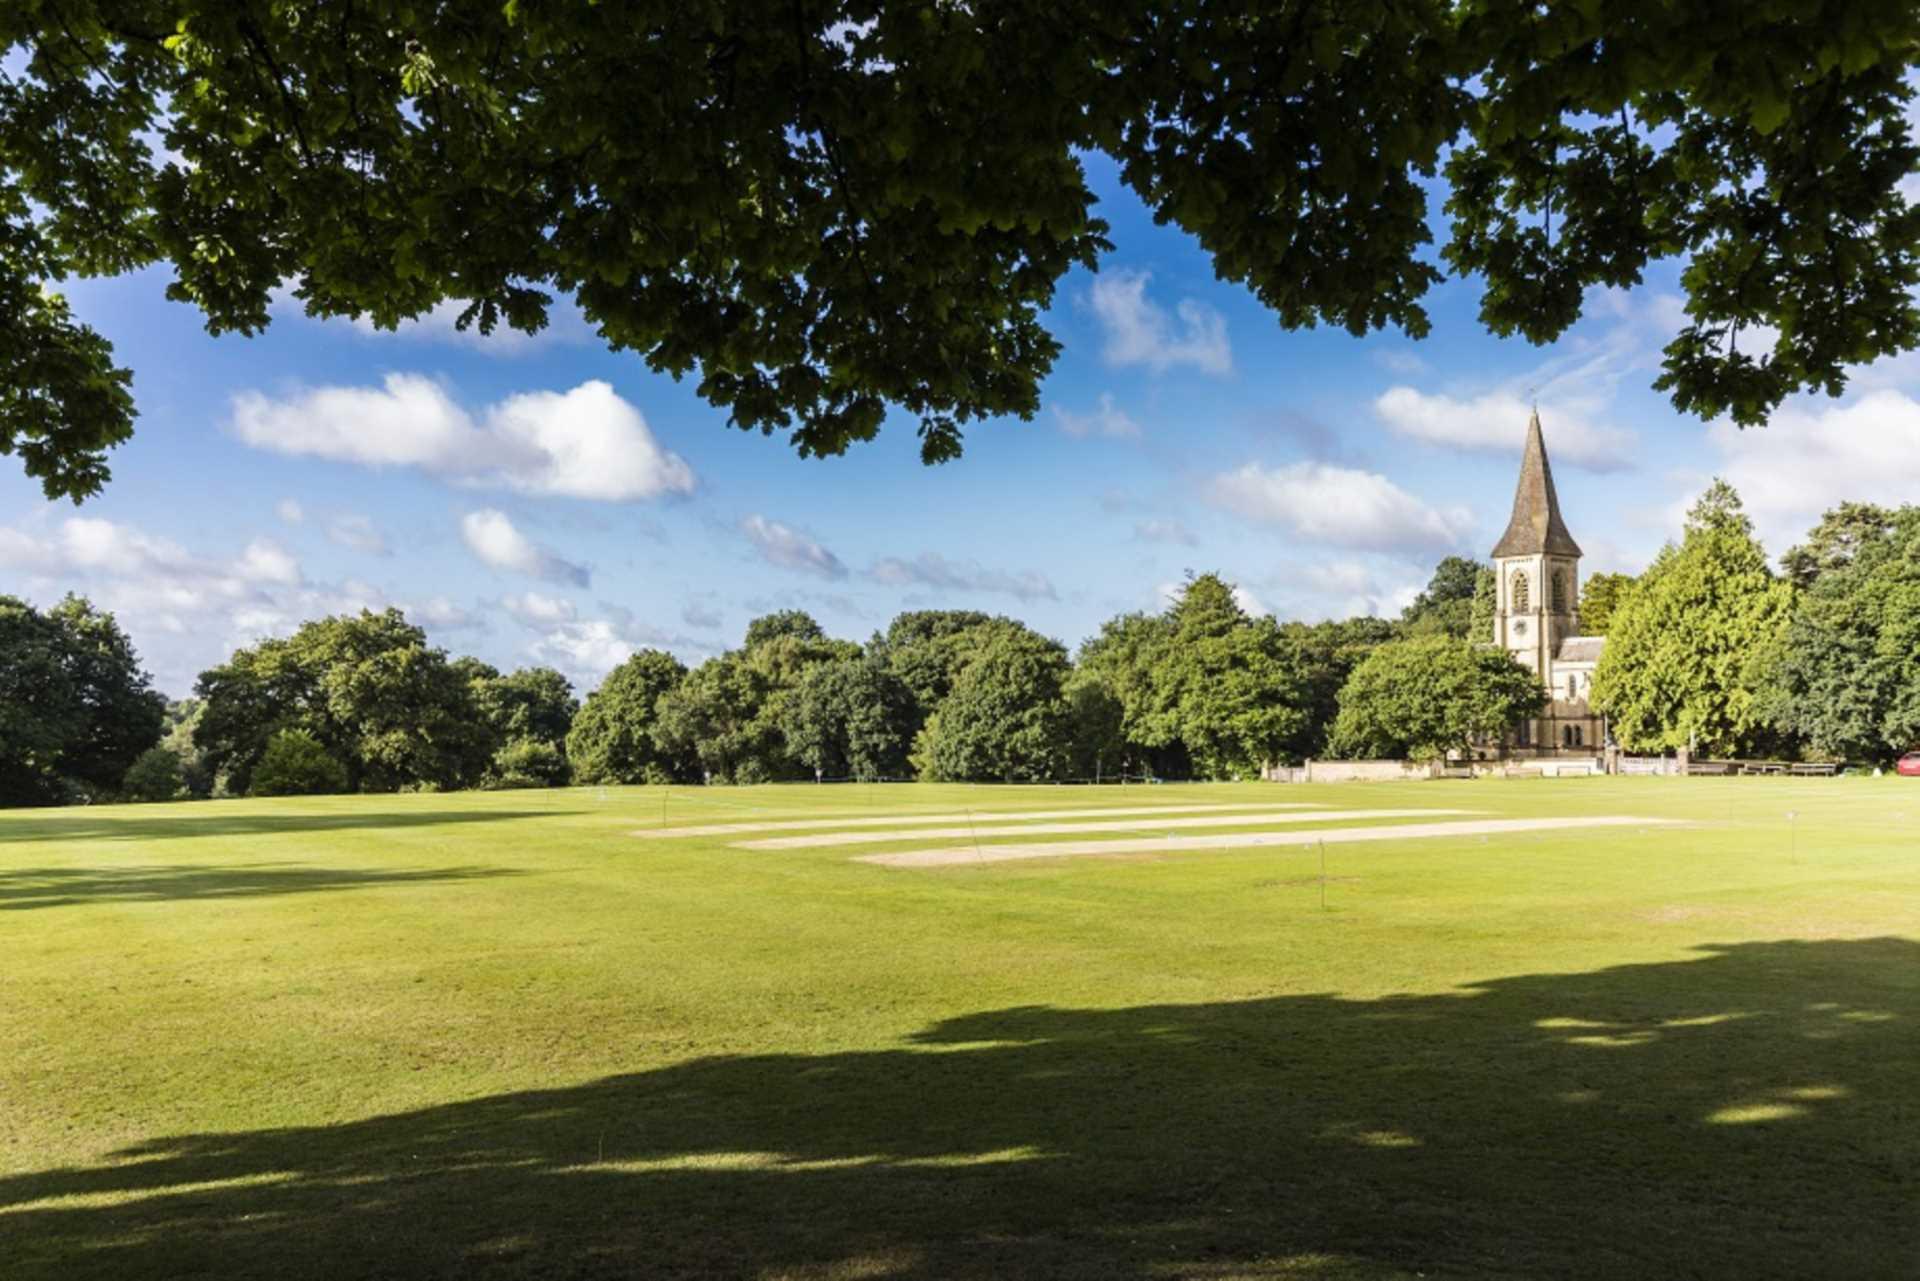 Park Road, Southborough, Tunbridge Wells, Image 22